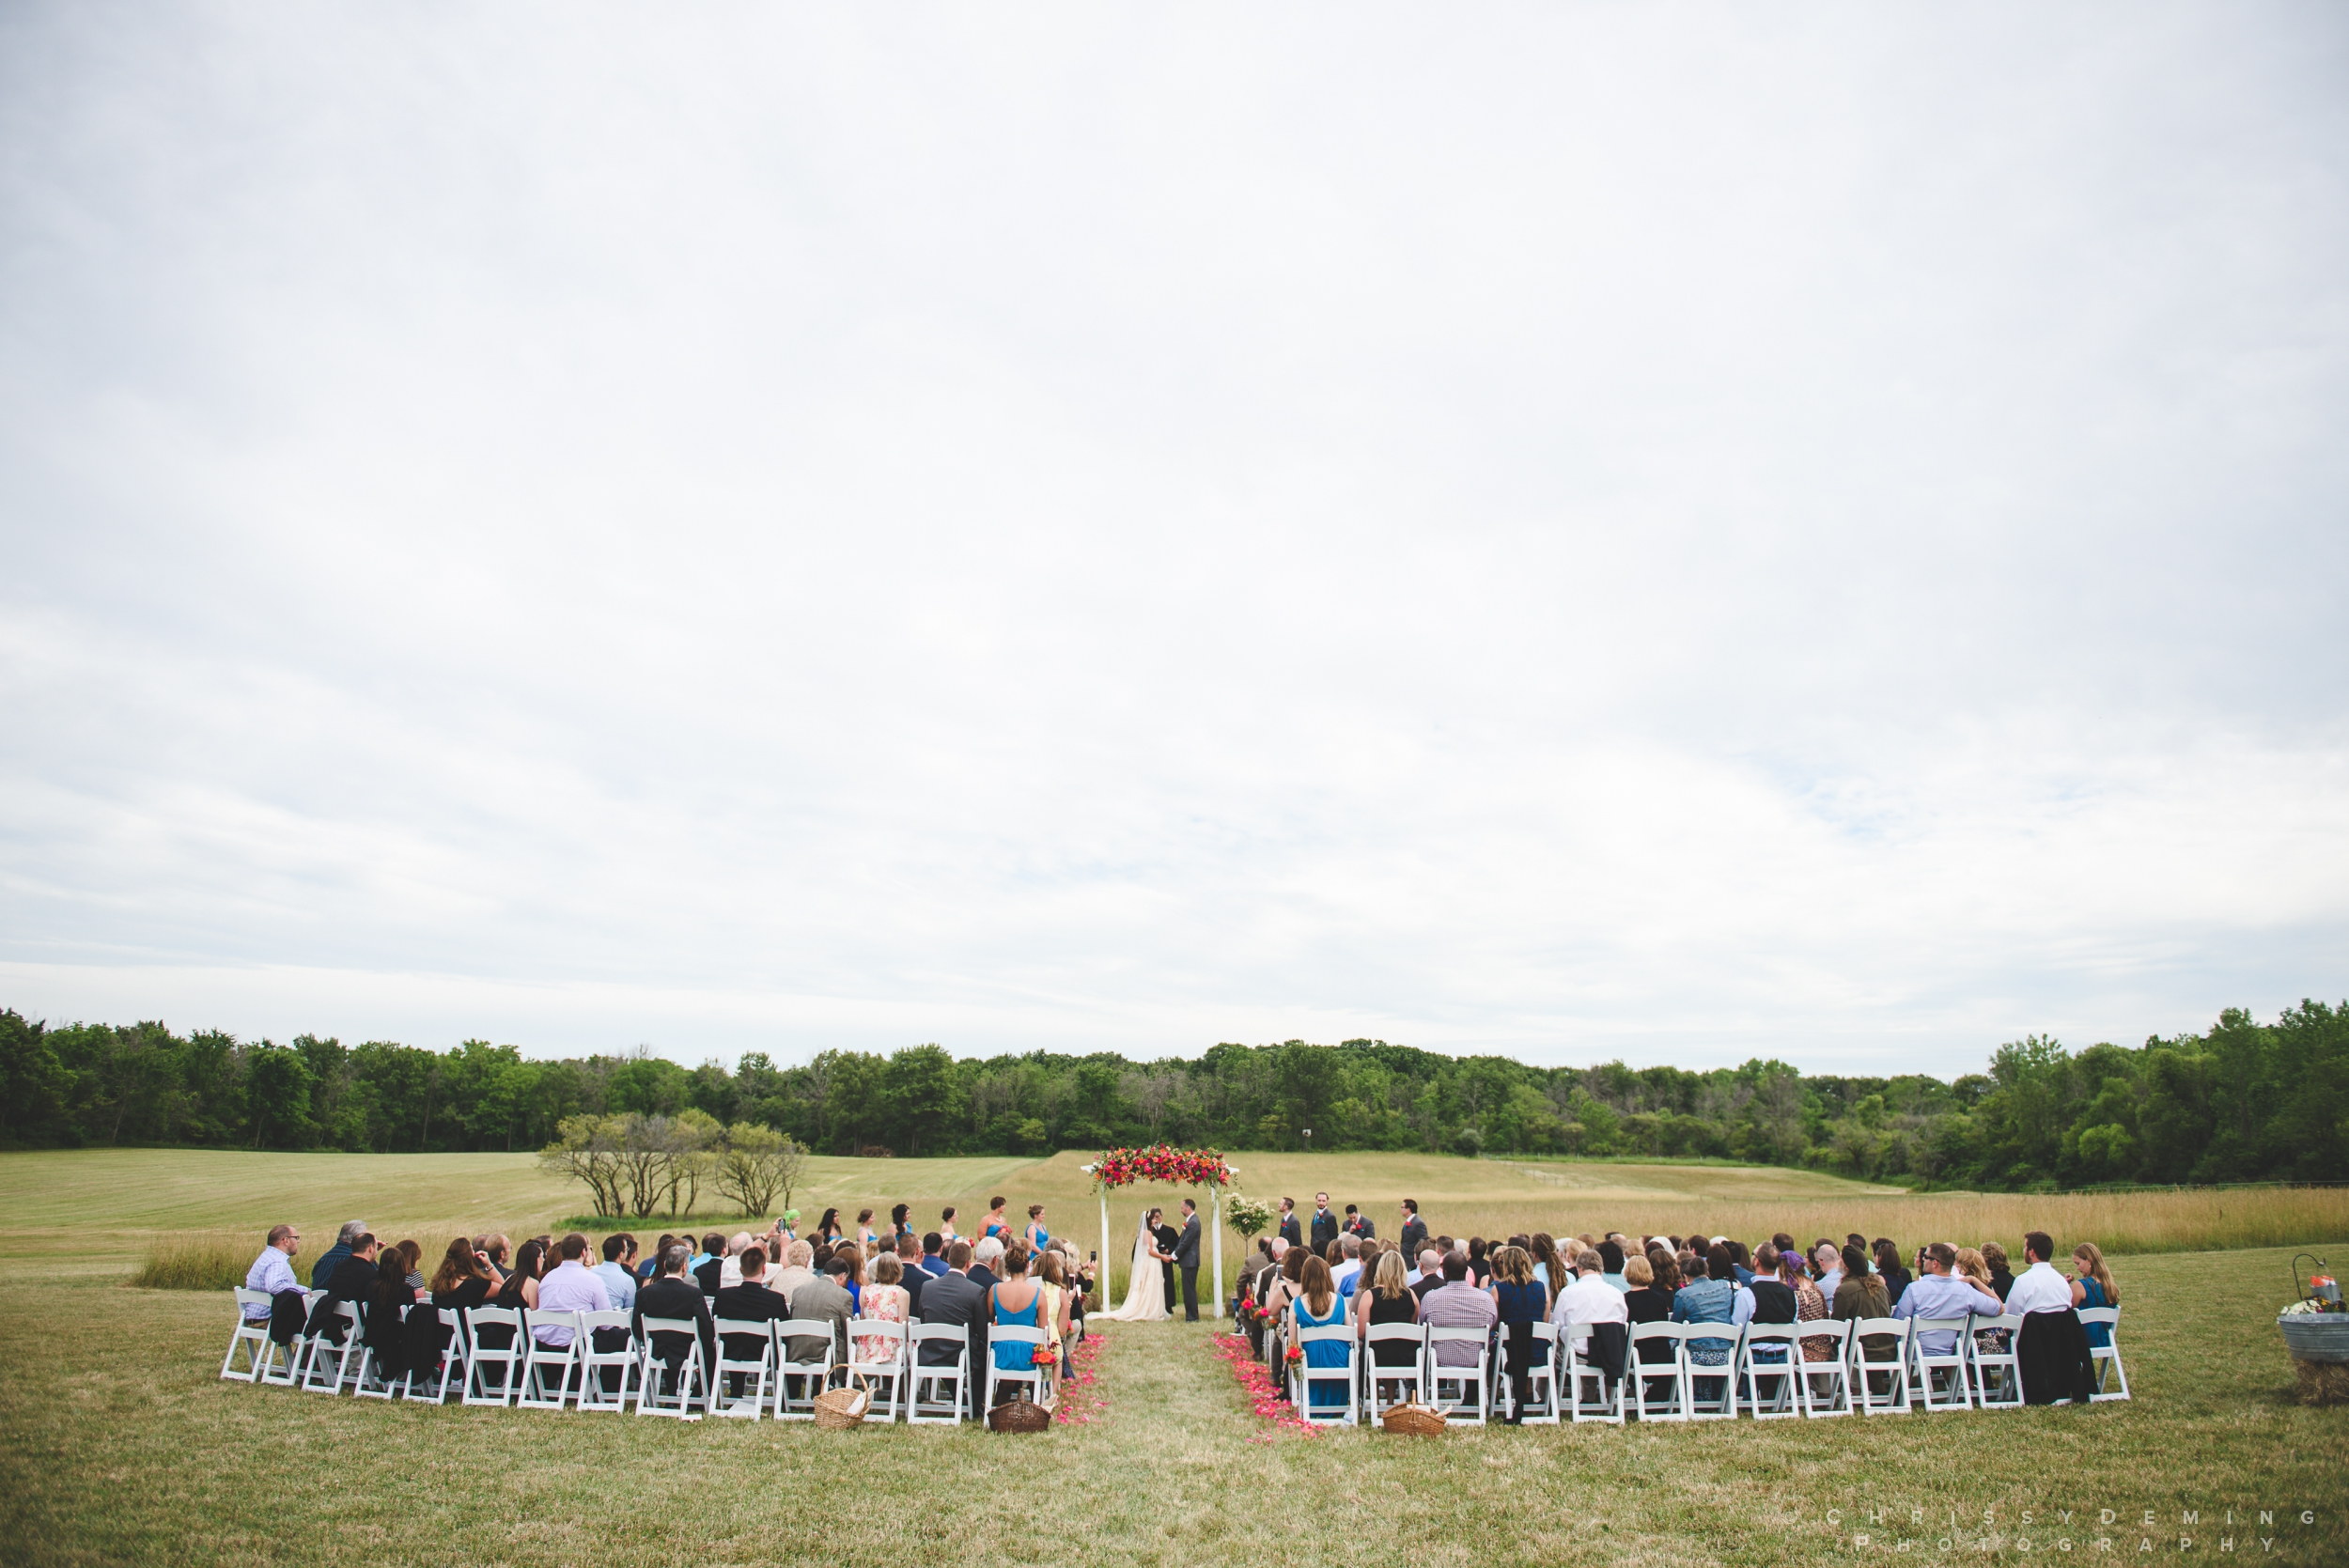 crete_IL_farm_wedding_photographer_0027.jpg